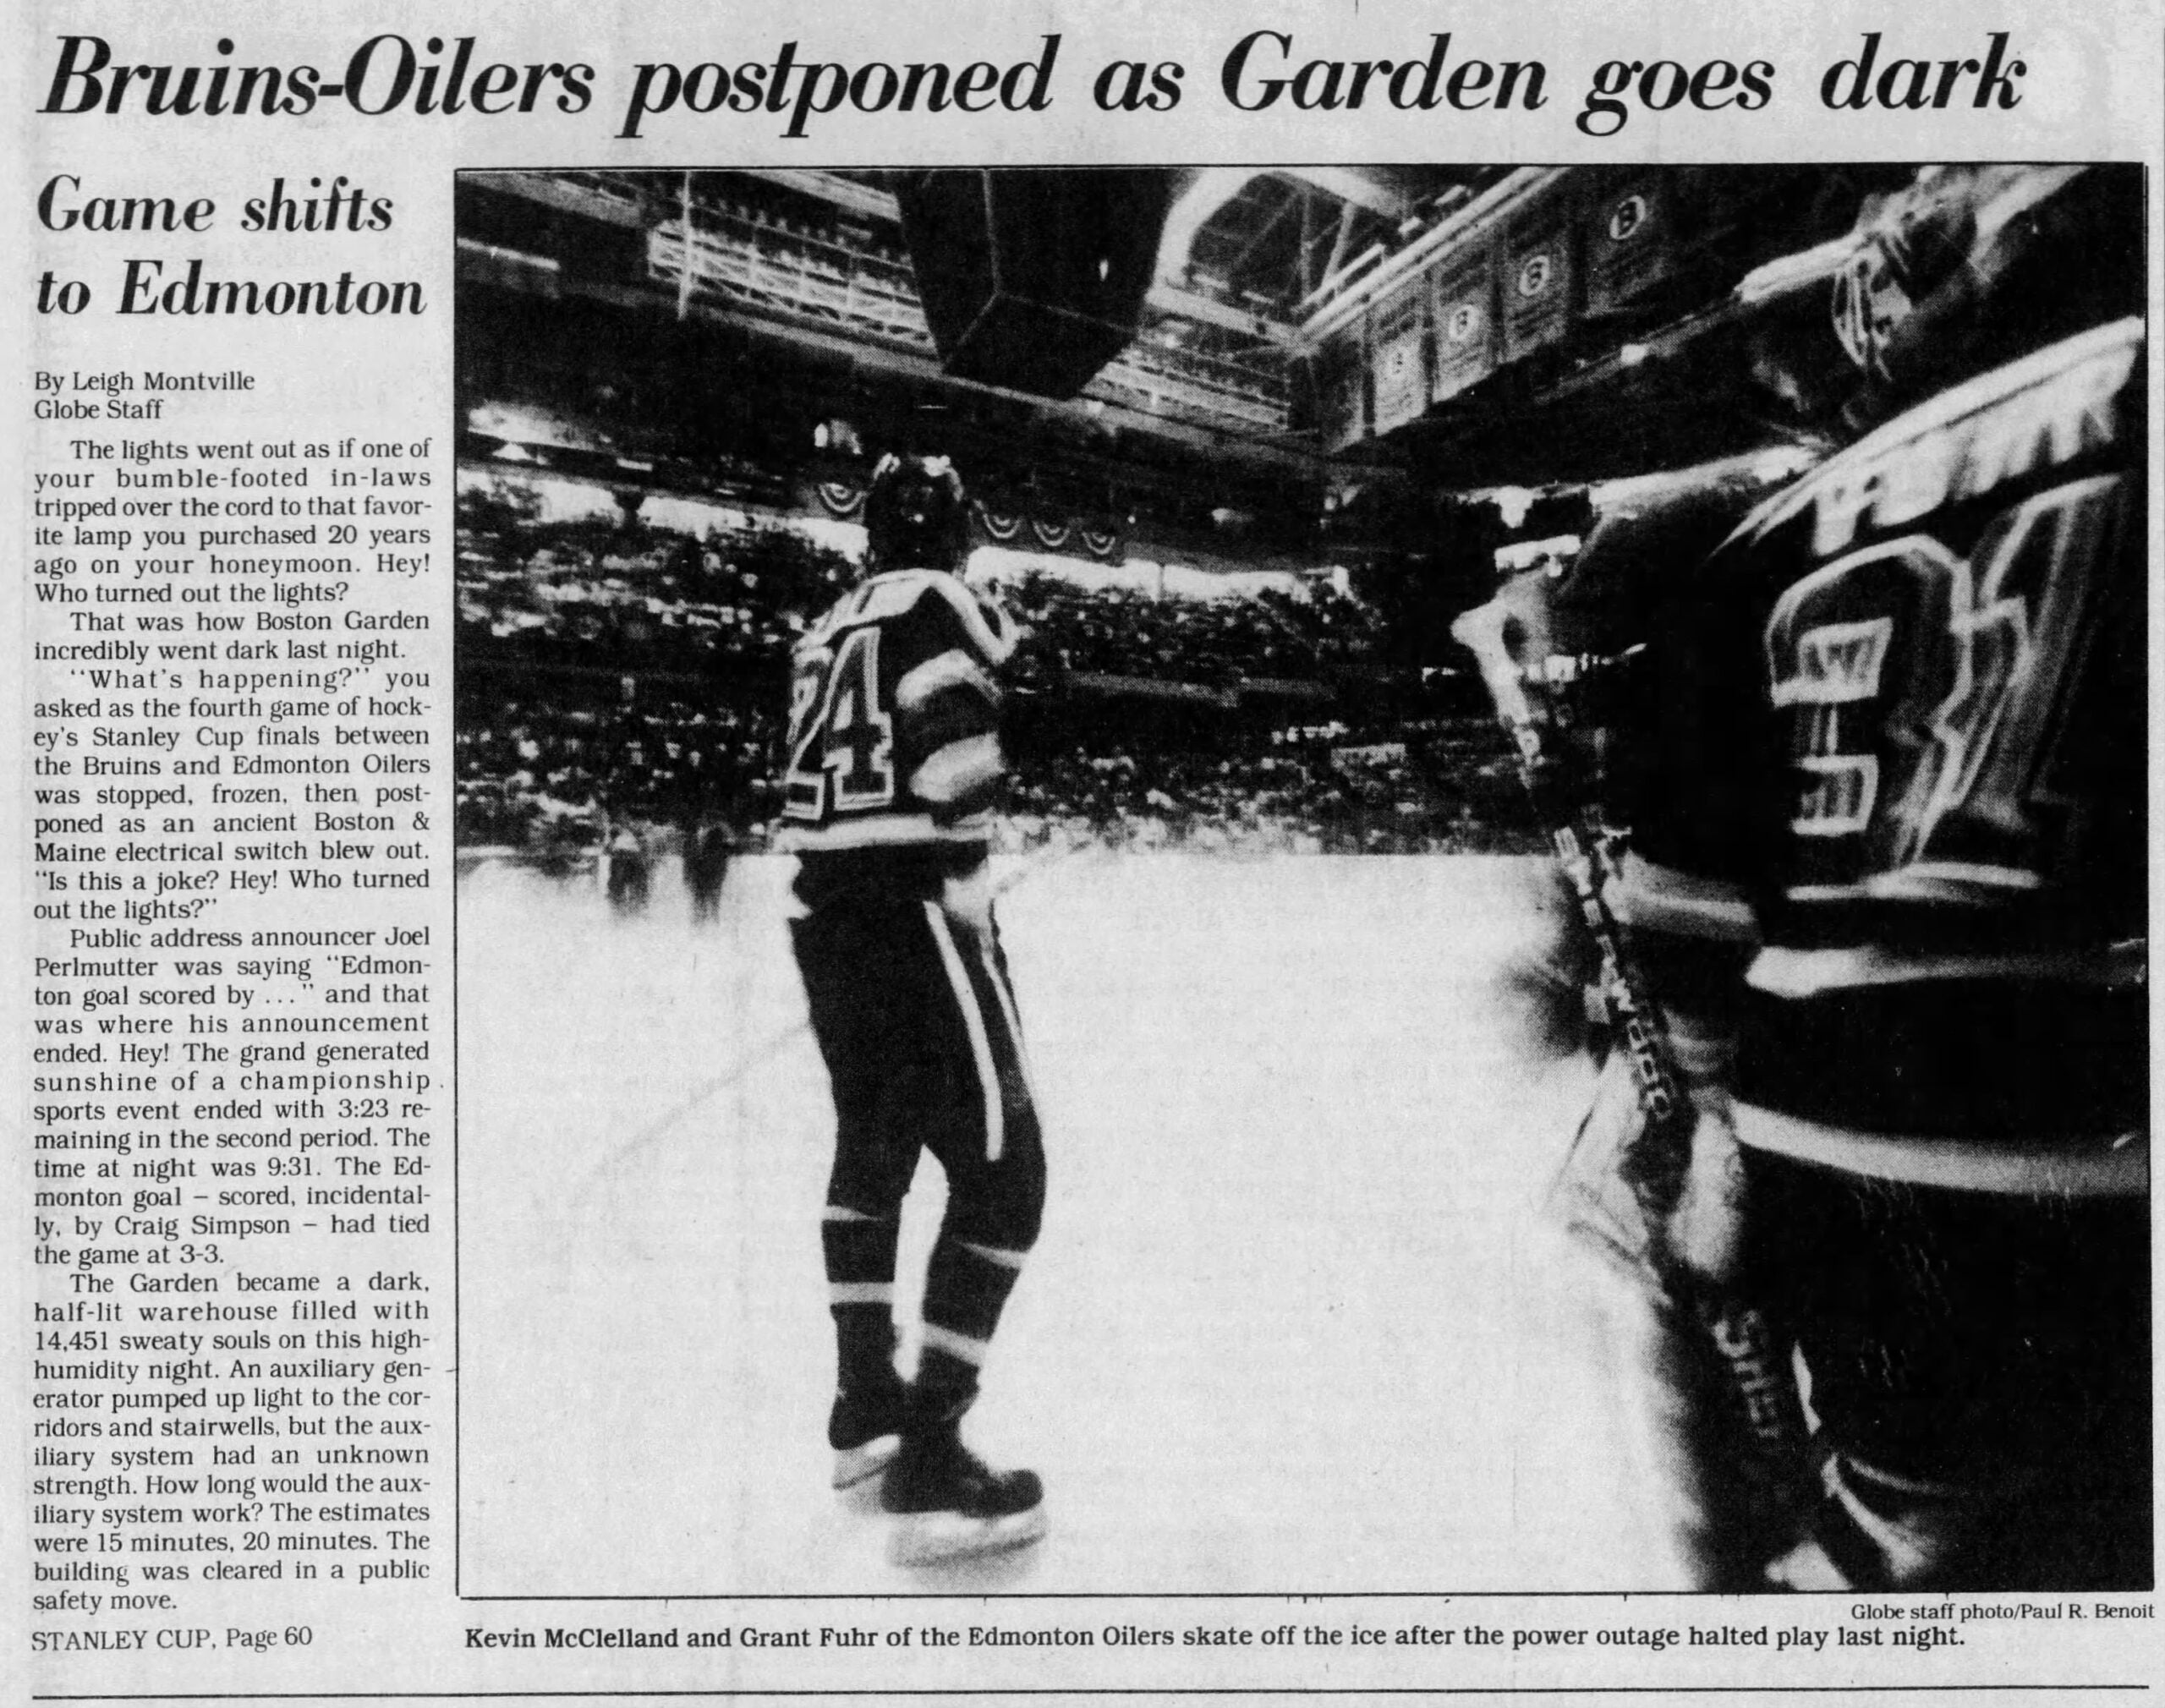 Bruins Stanley Cup Boston Globe 1988